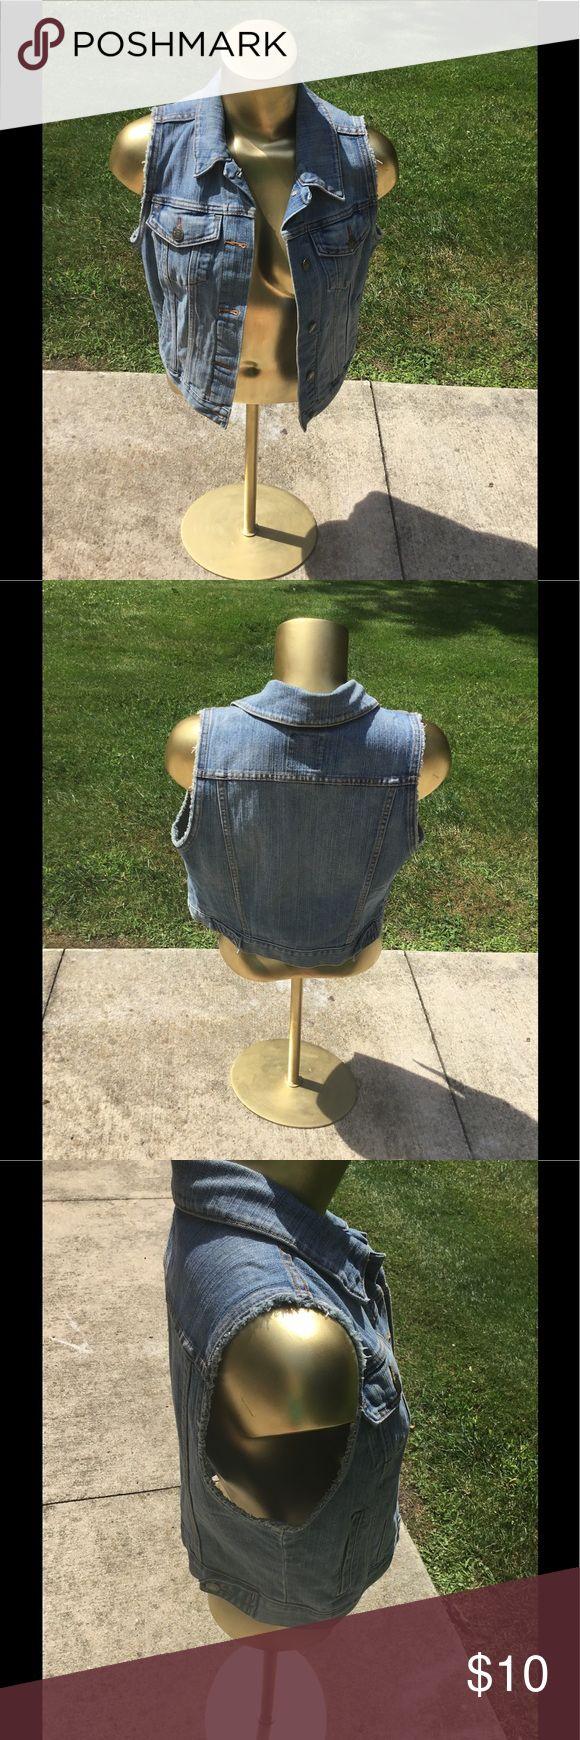 Old Navy jean Jacket Vest...Size Medium Old Navy Jean Jacket Vest ...Size Medium... Excellent condition Old Navy Jackets & Coats Vests